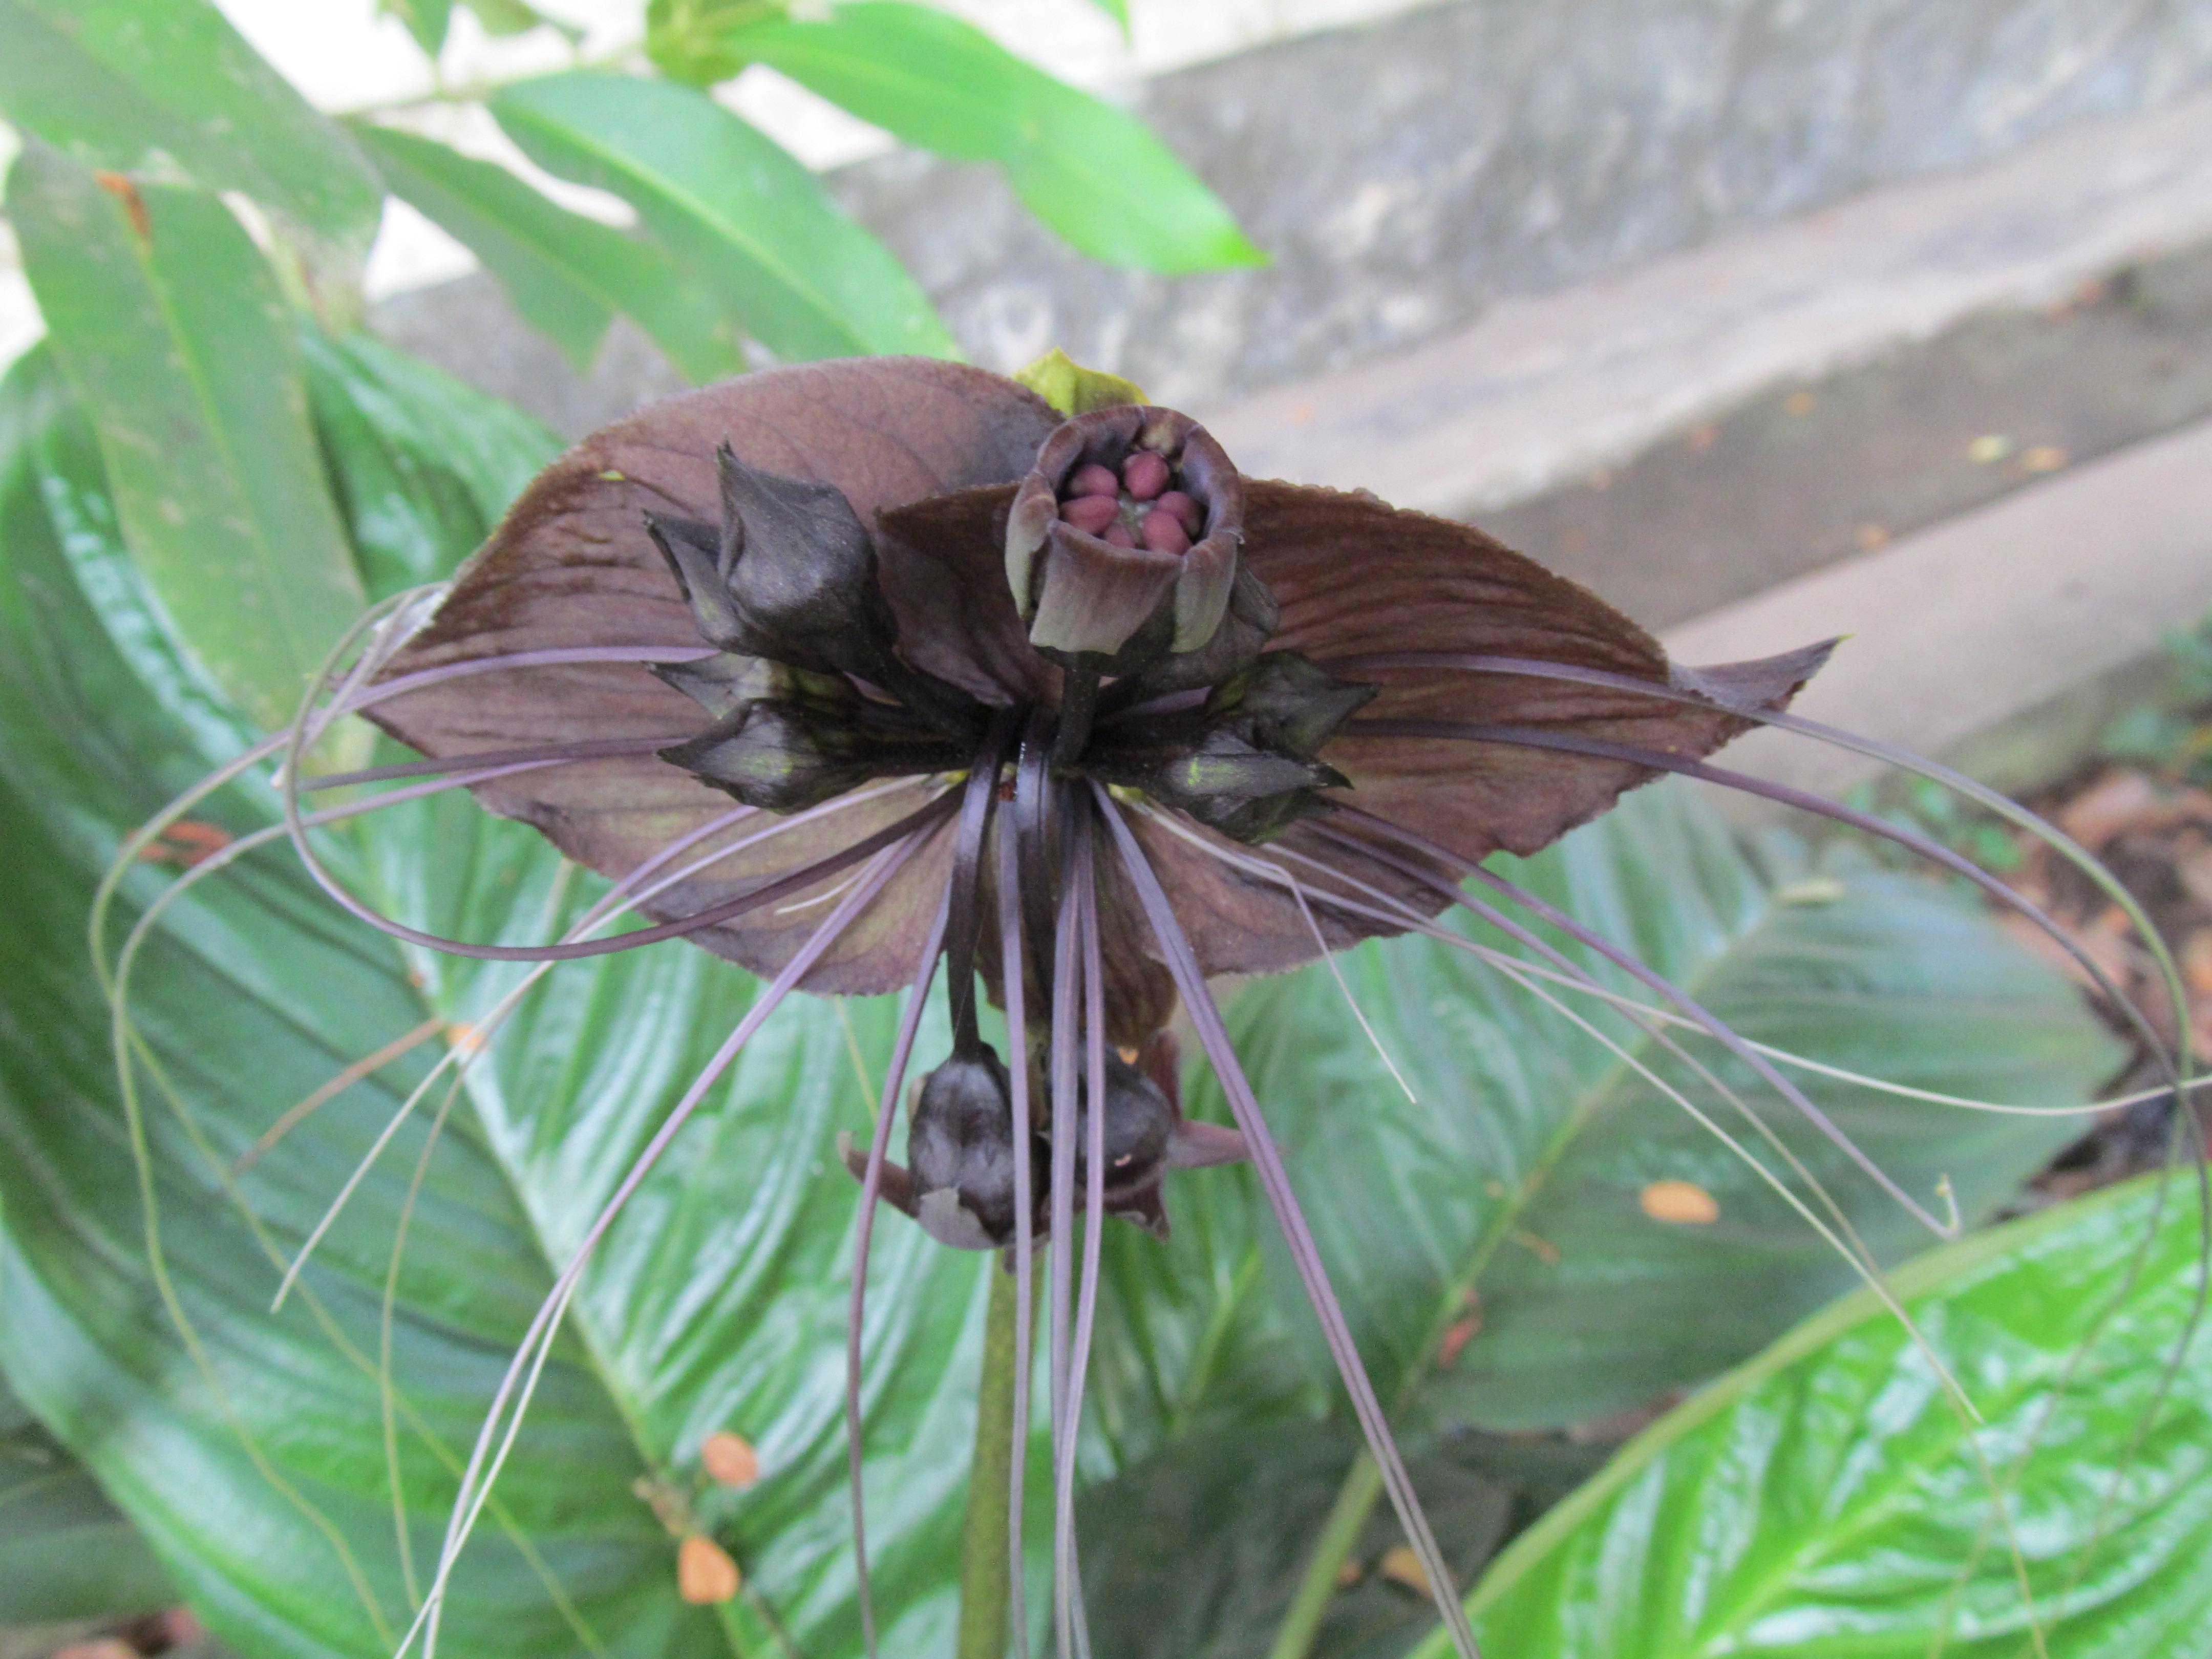 File Tacca chantrieri Kerala Vavvalpoovu black bat flower 04 JPG Wikime